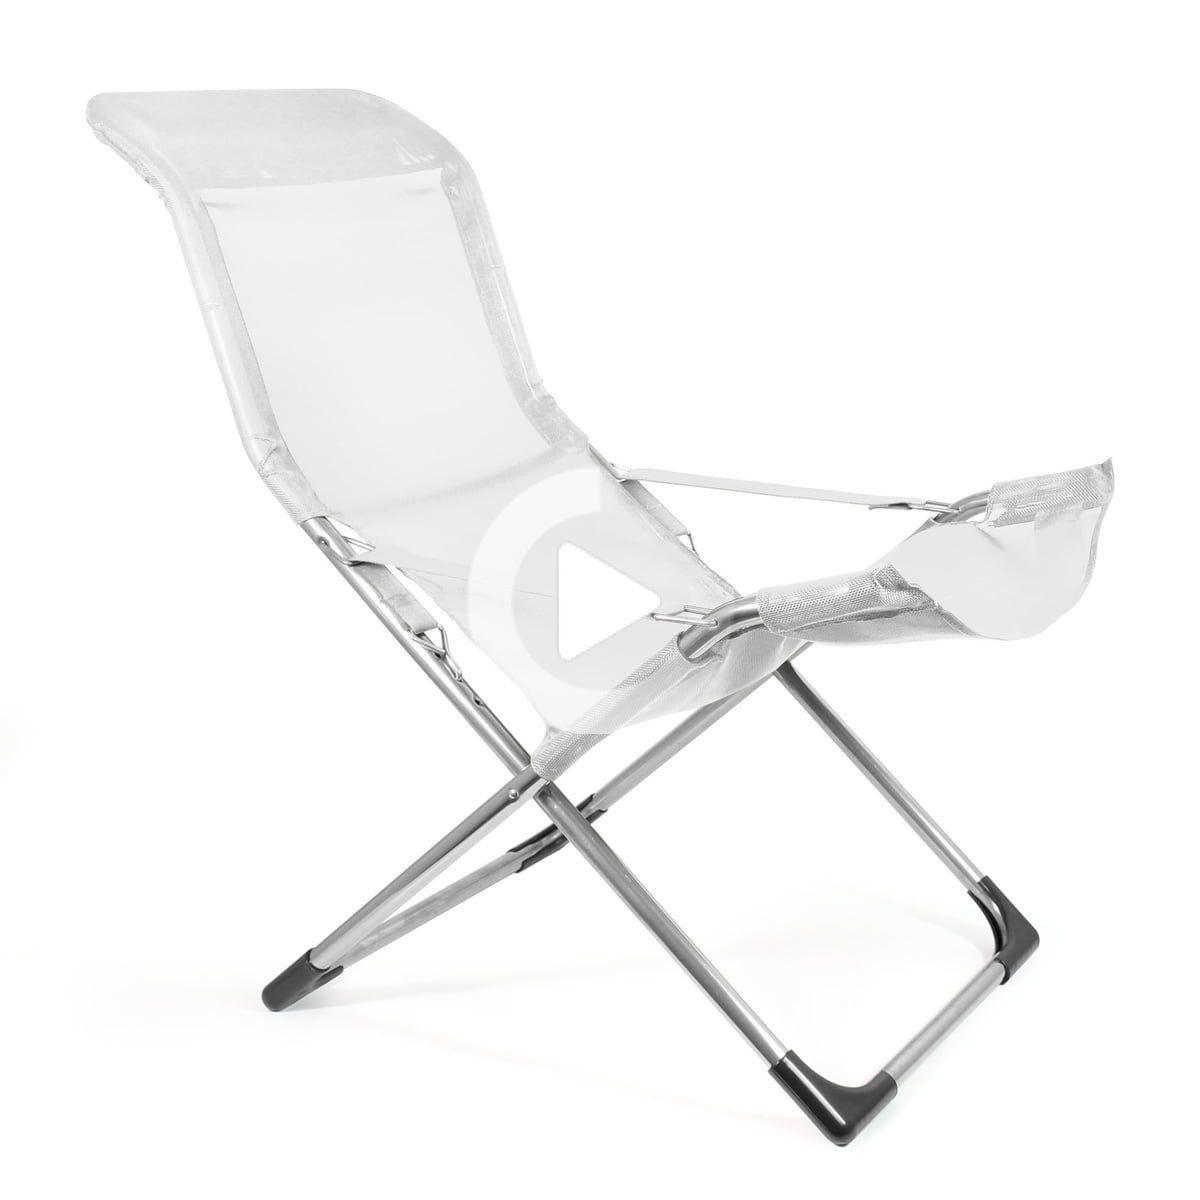 Fiam Fiesta Sessel Aluminium Weiss In 2020 Outdoor Chairs Chair Aluminum